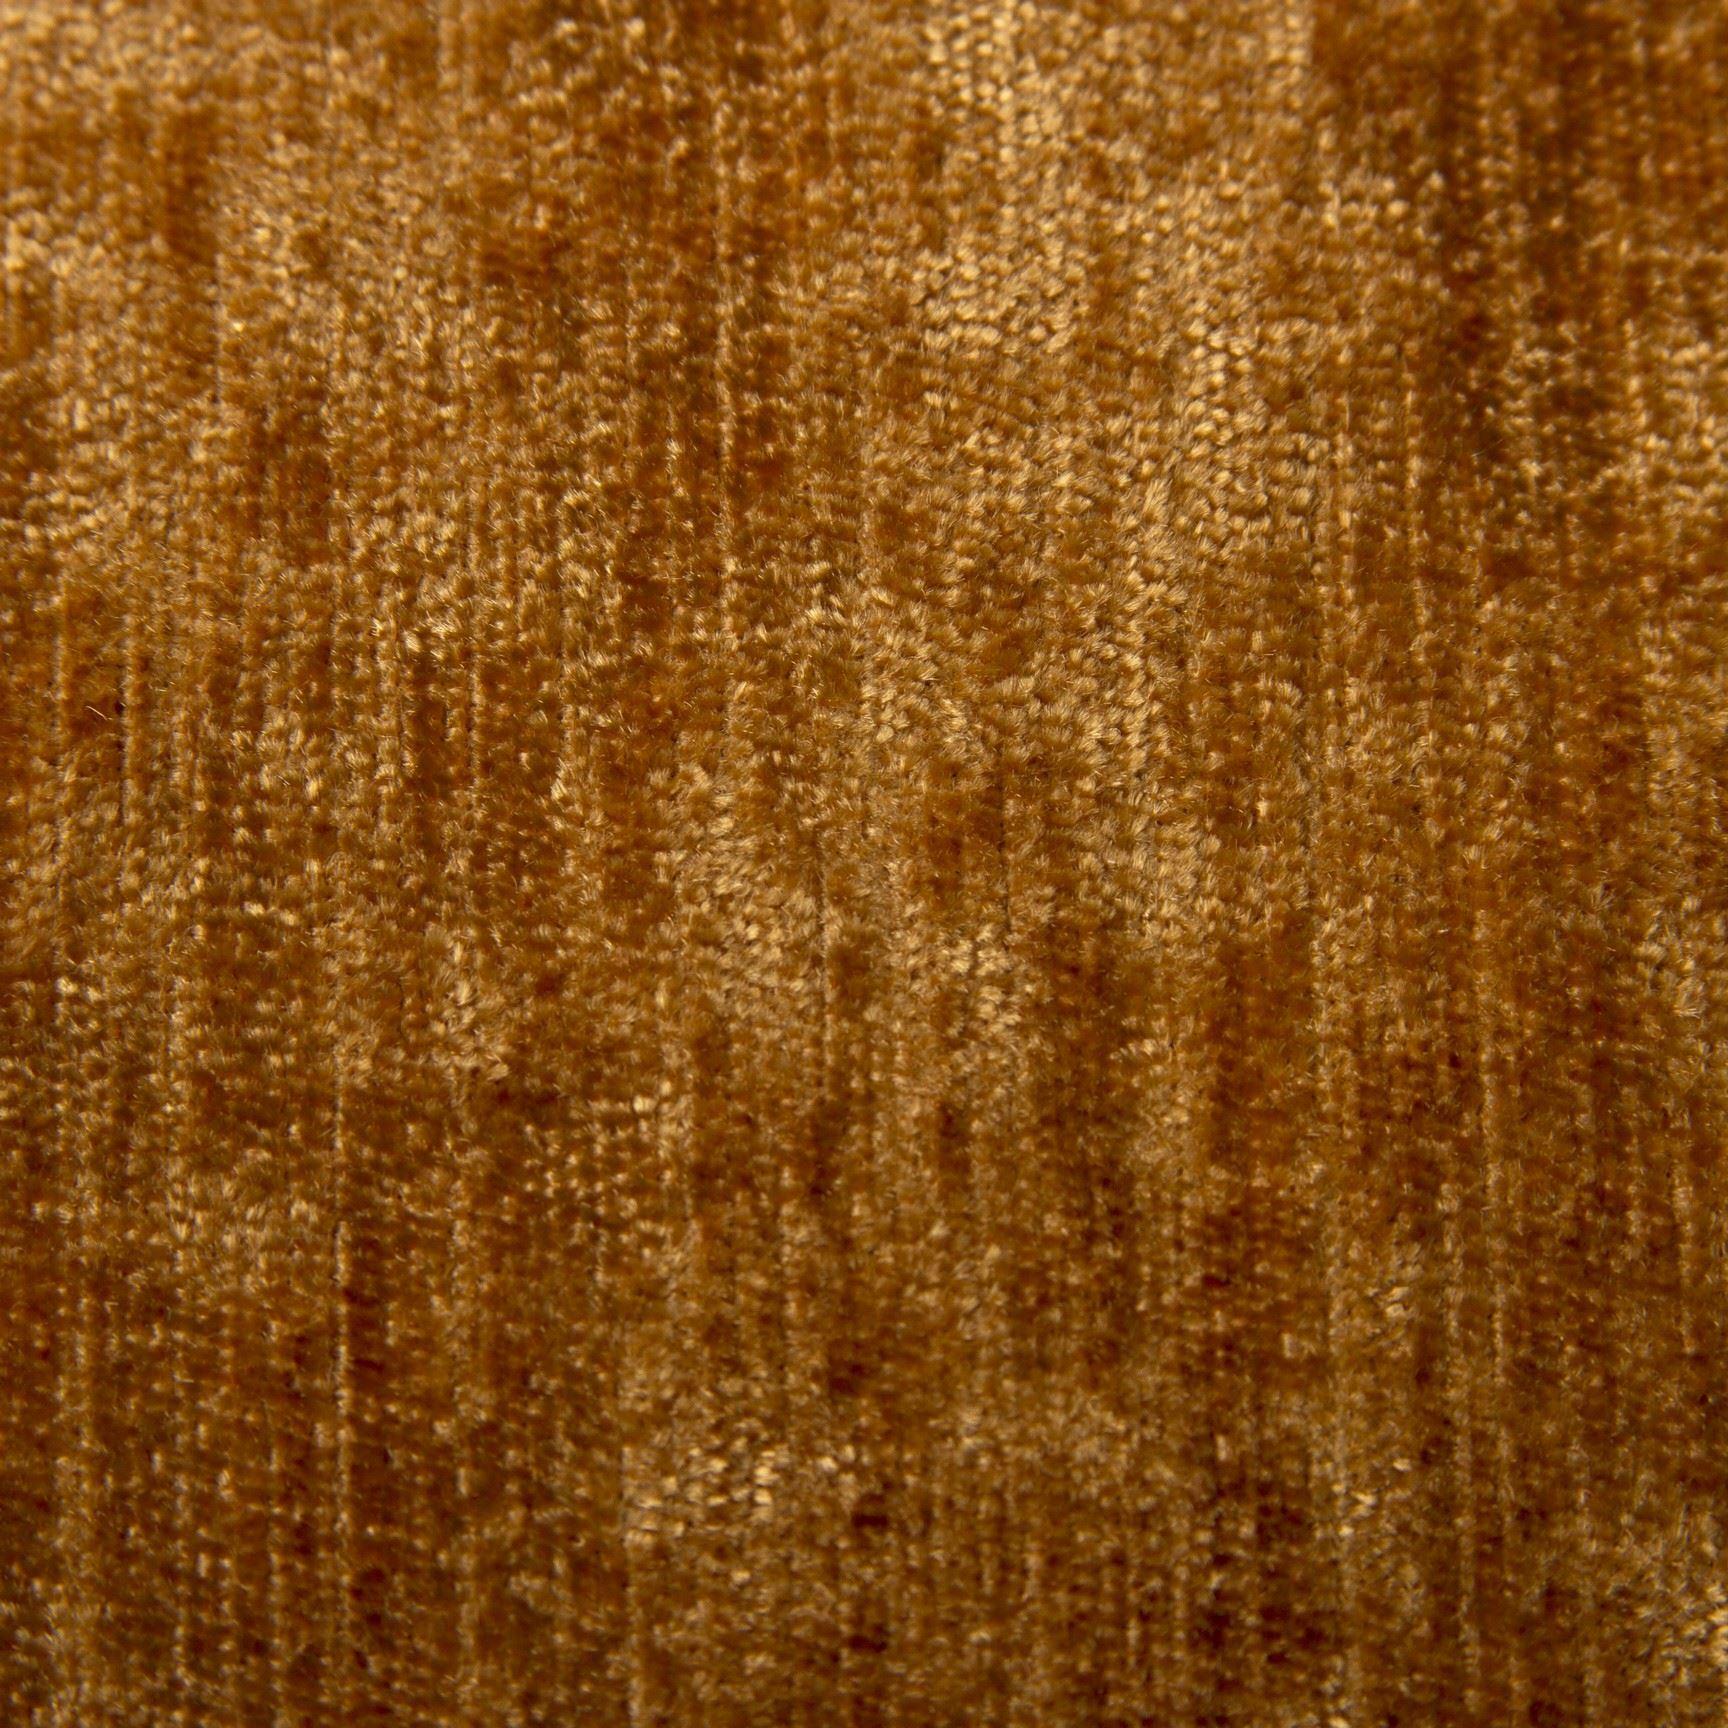 thumbnail 12 - LUXURY PLUSH CRUSHED SATIN VELVET SUPER SOFT HEAVY WEIGHT UPHOLSTERY FABRIC